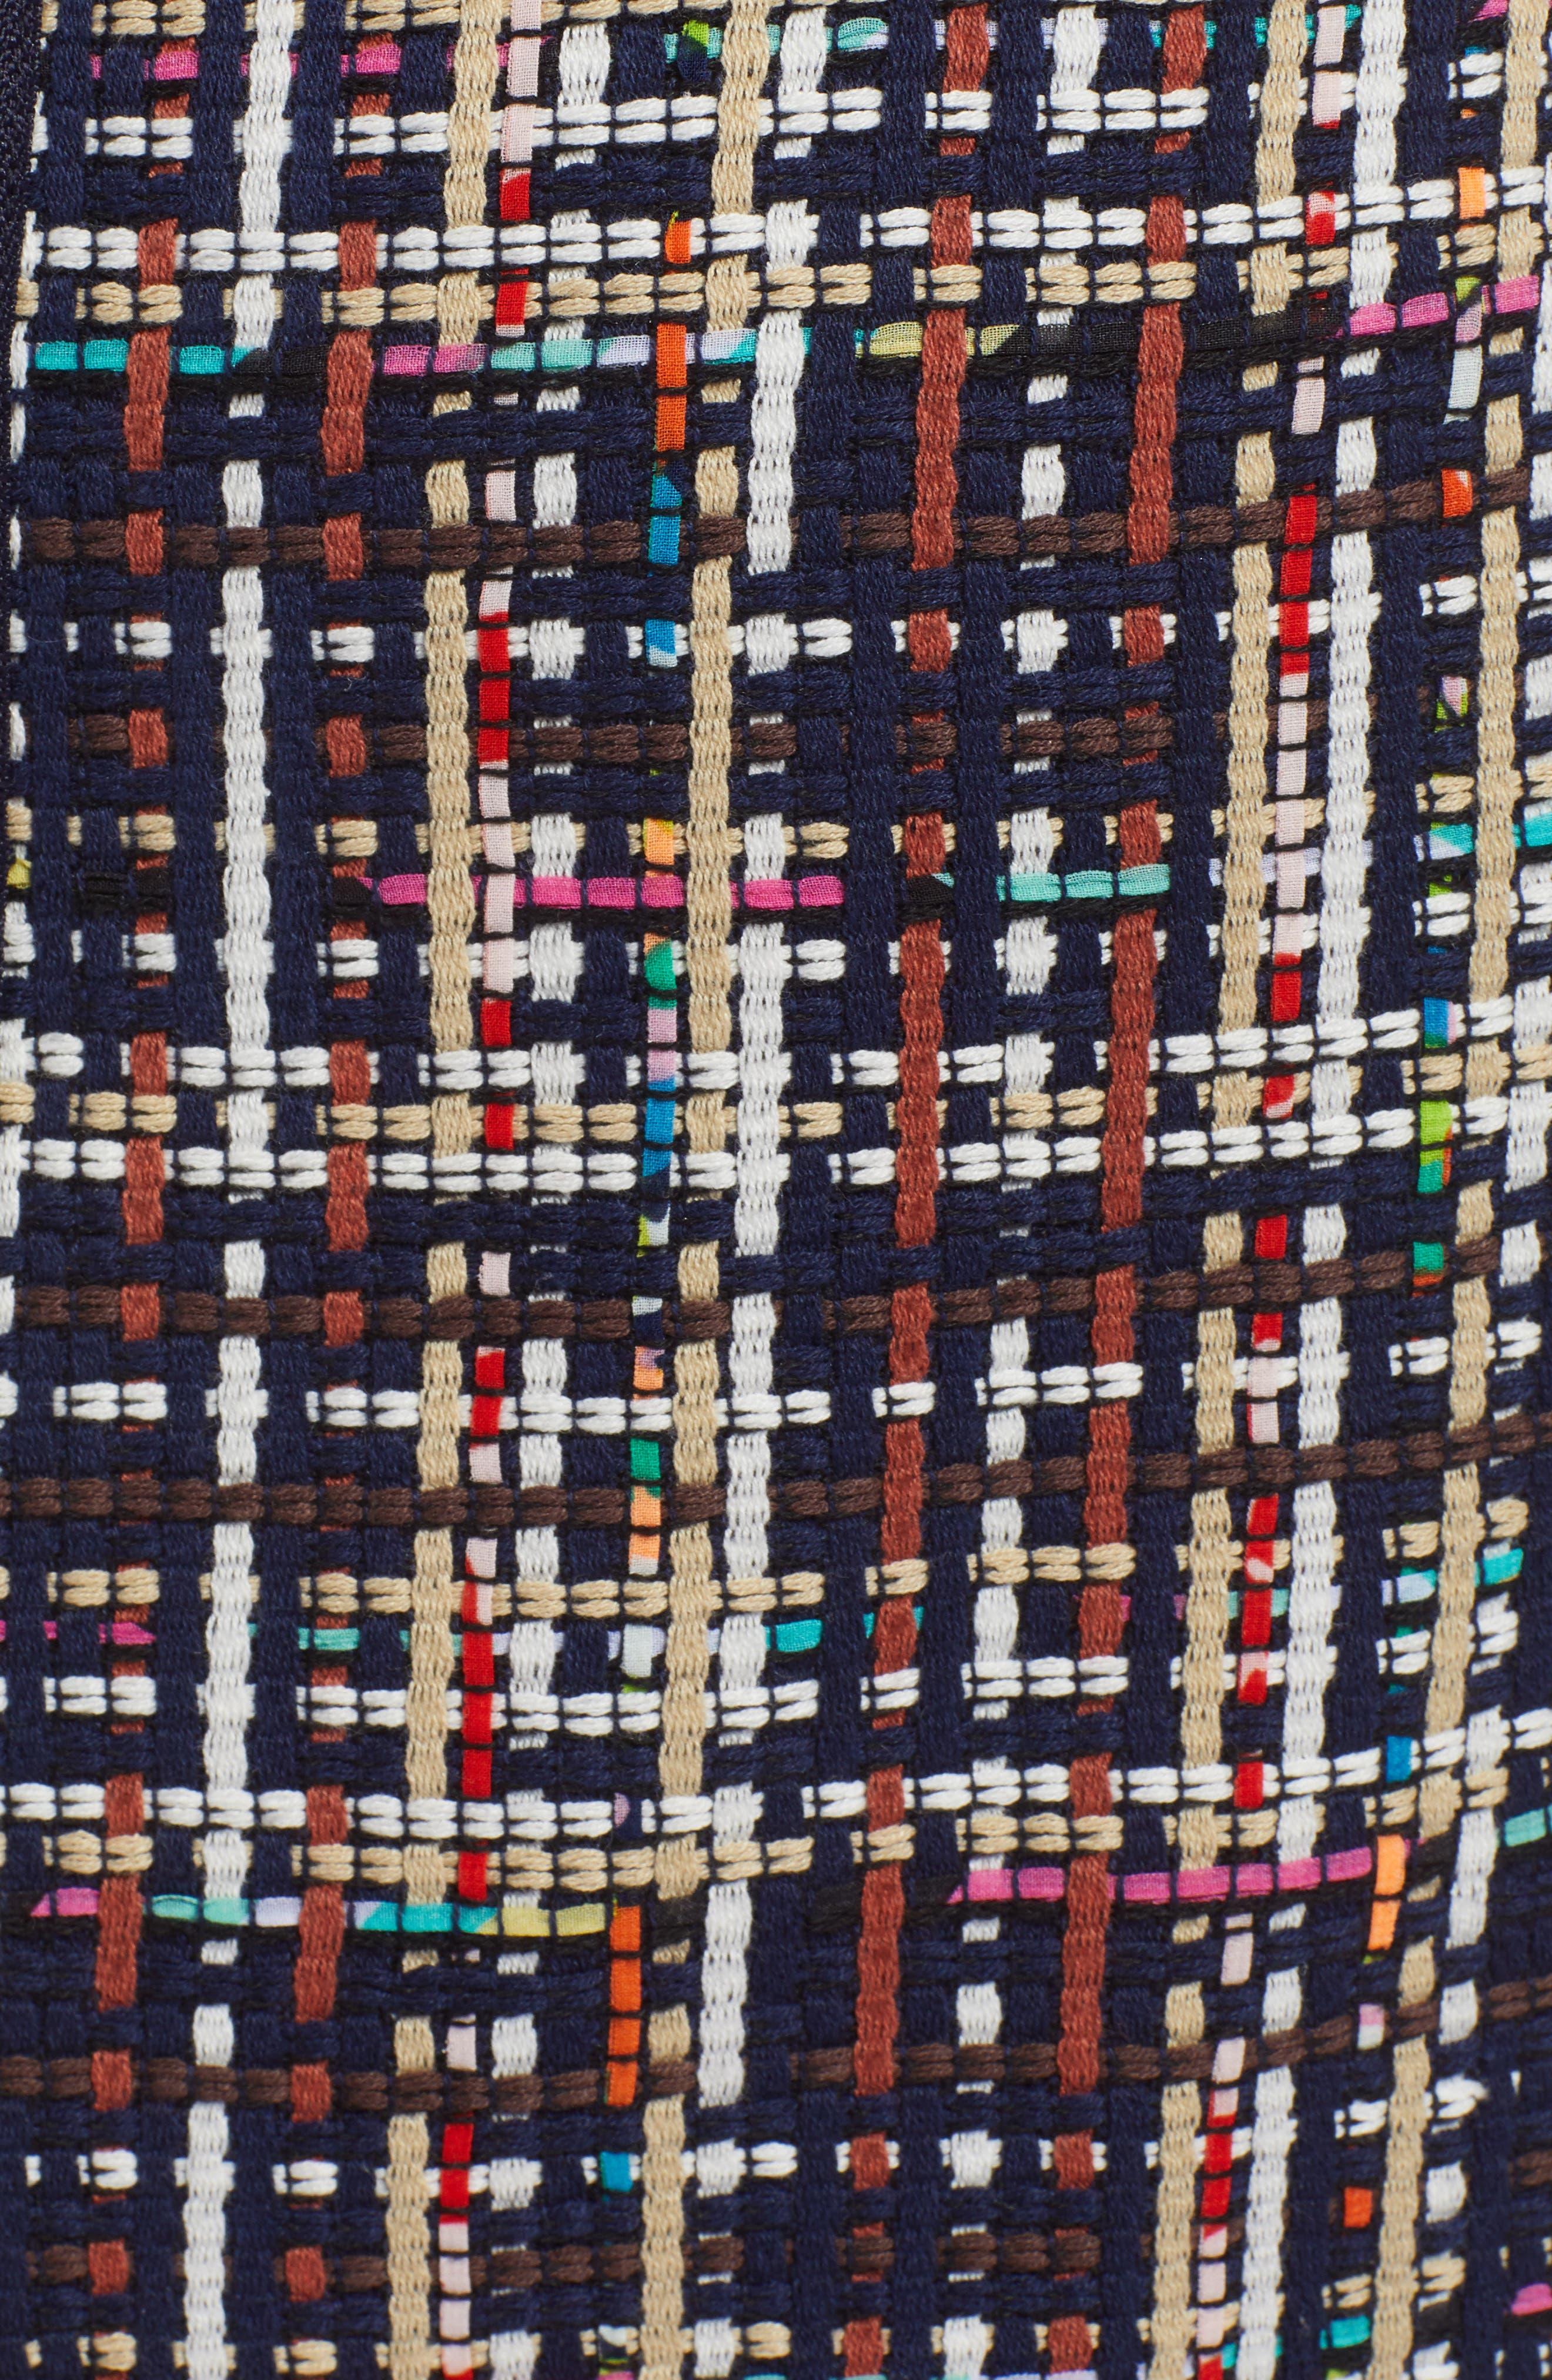 Tweed Mini Skirt,                             Alternate thumbnail 5, color,                             Navy Multi Tweed